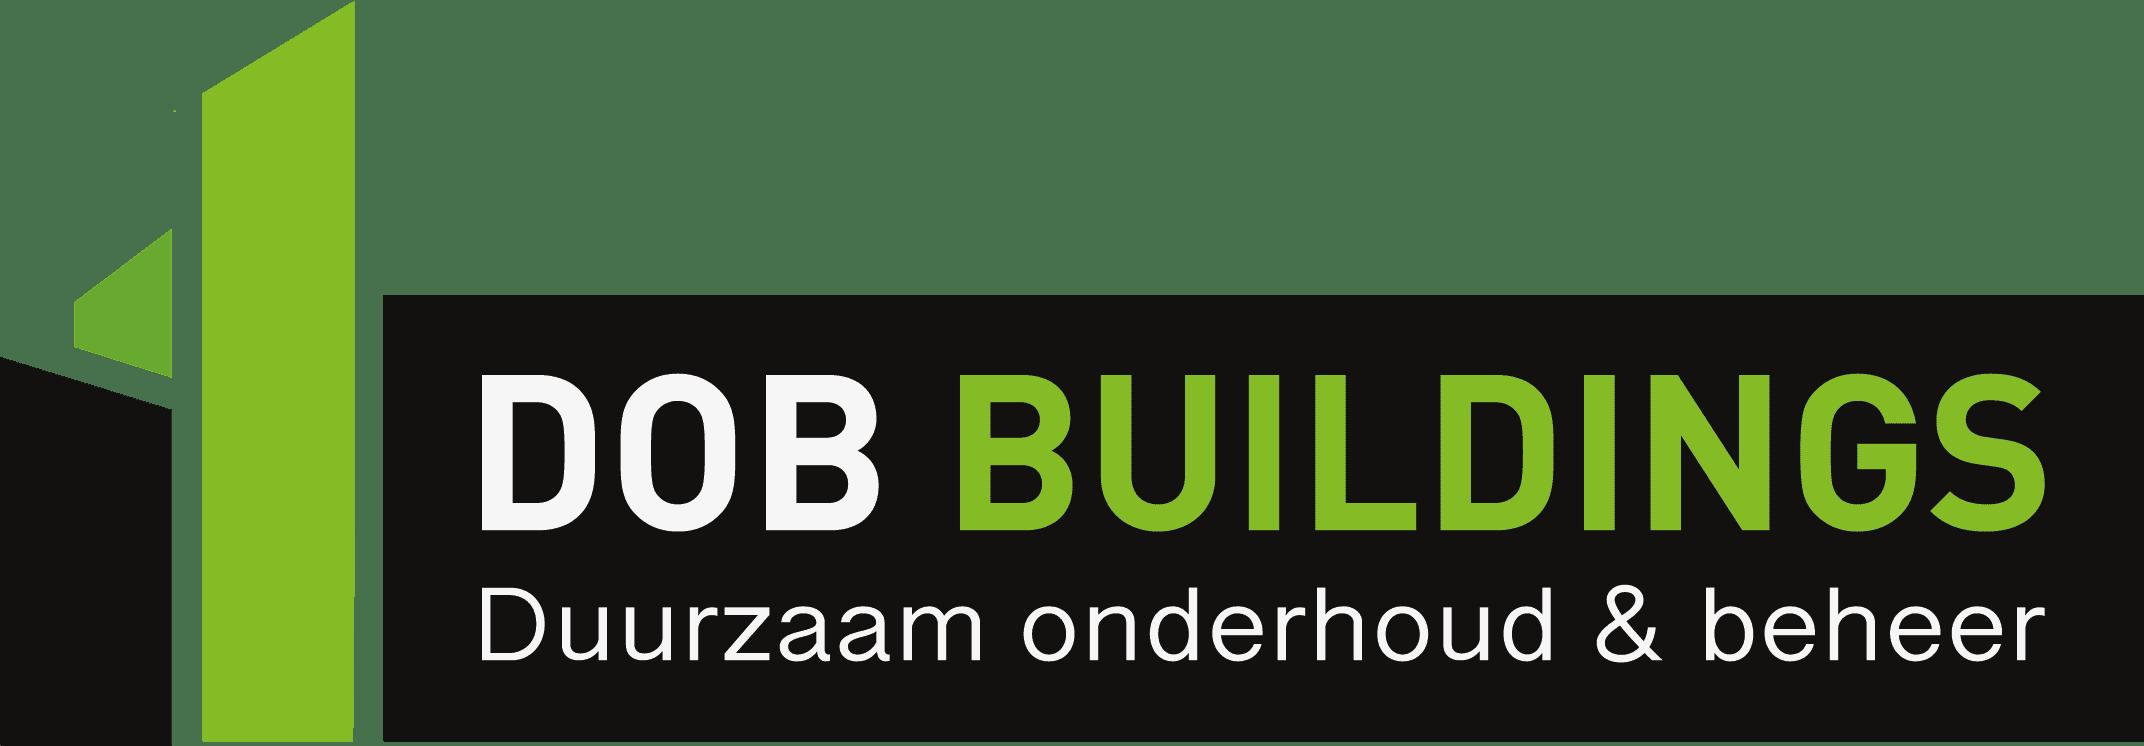 DOB Buildings